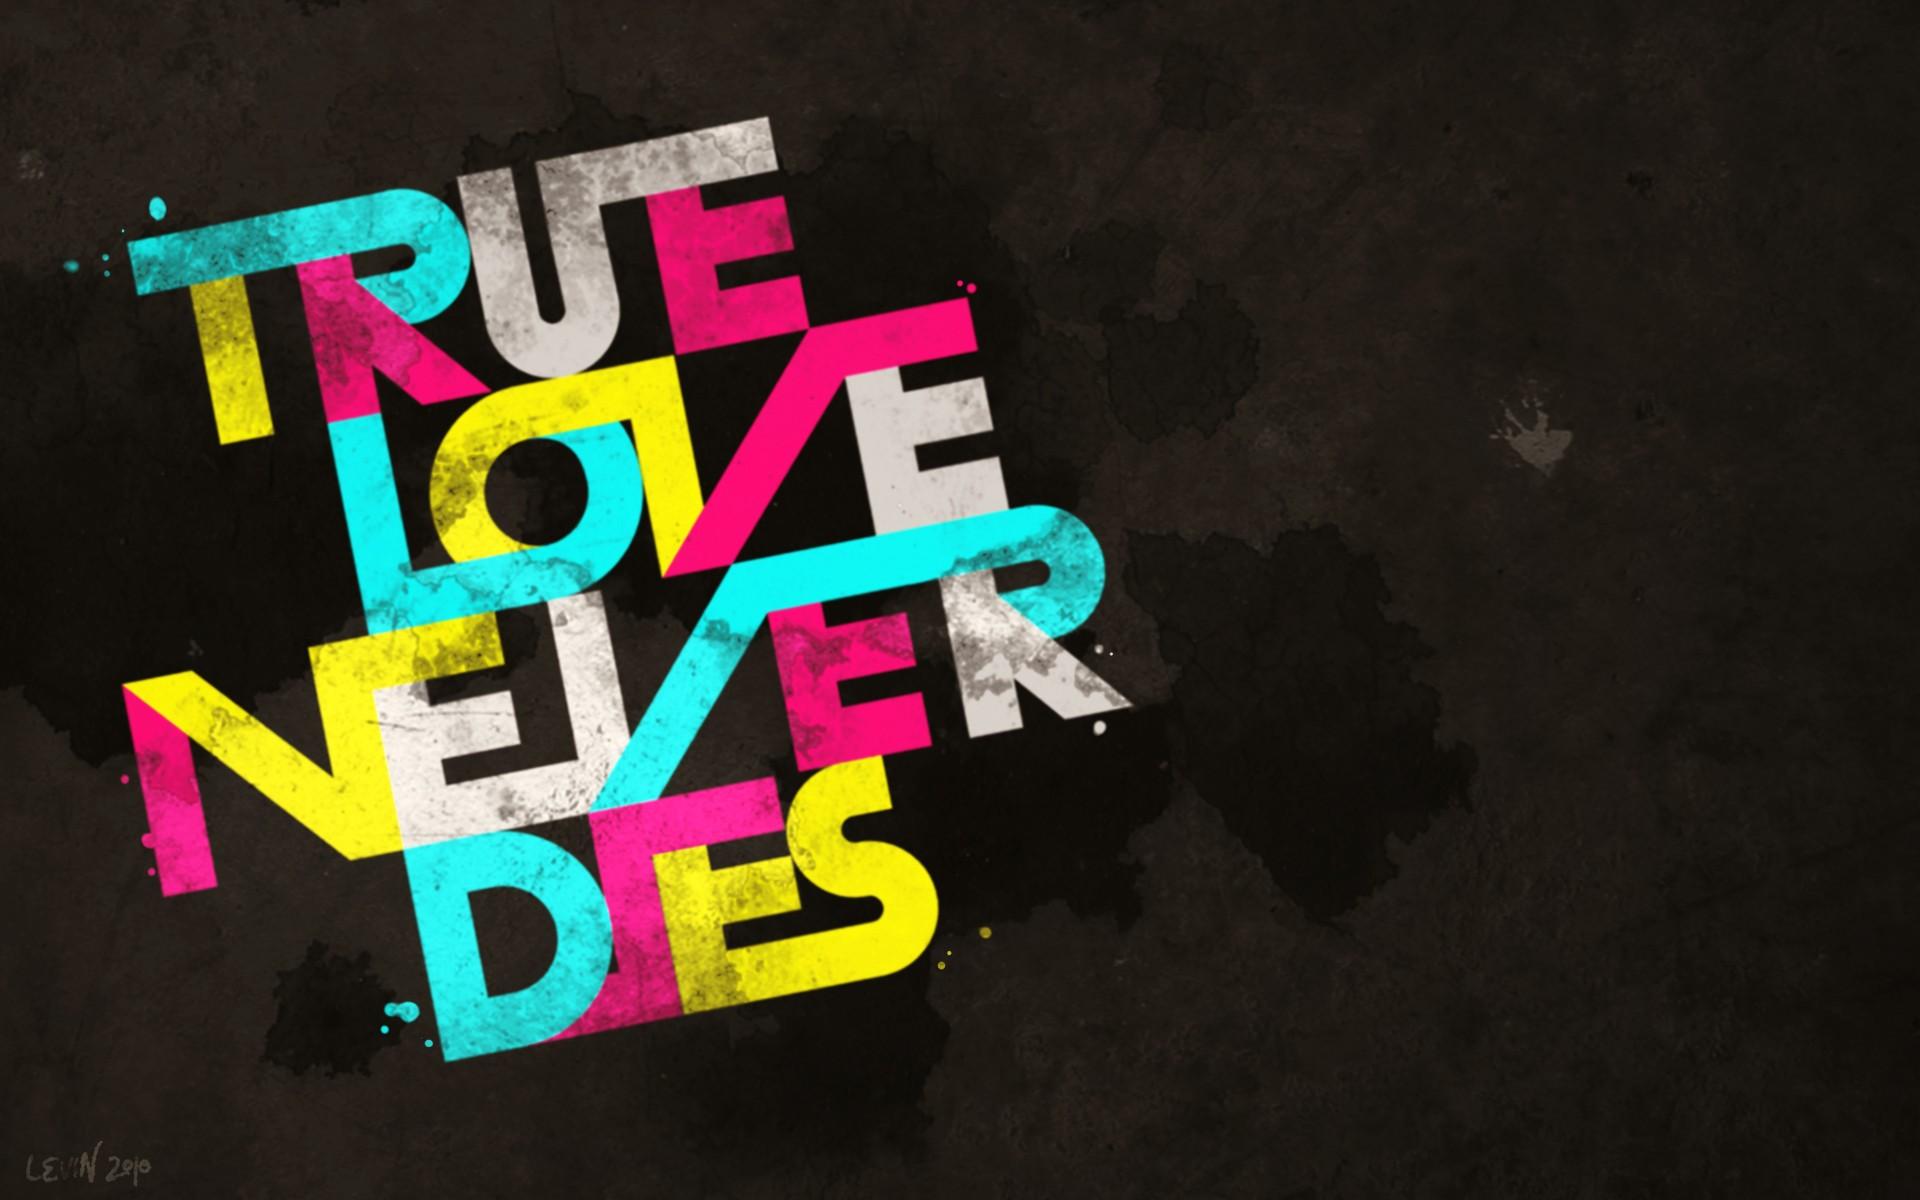 True Love Quotes Wallpapers HD Wallpaper of Love   hdwallpaper2013com 1920x1200